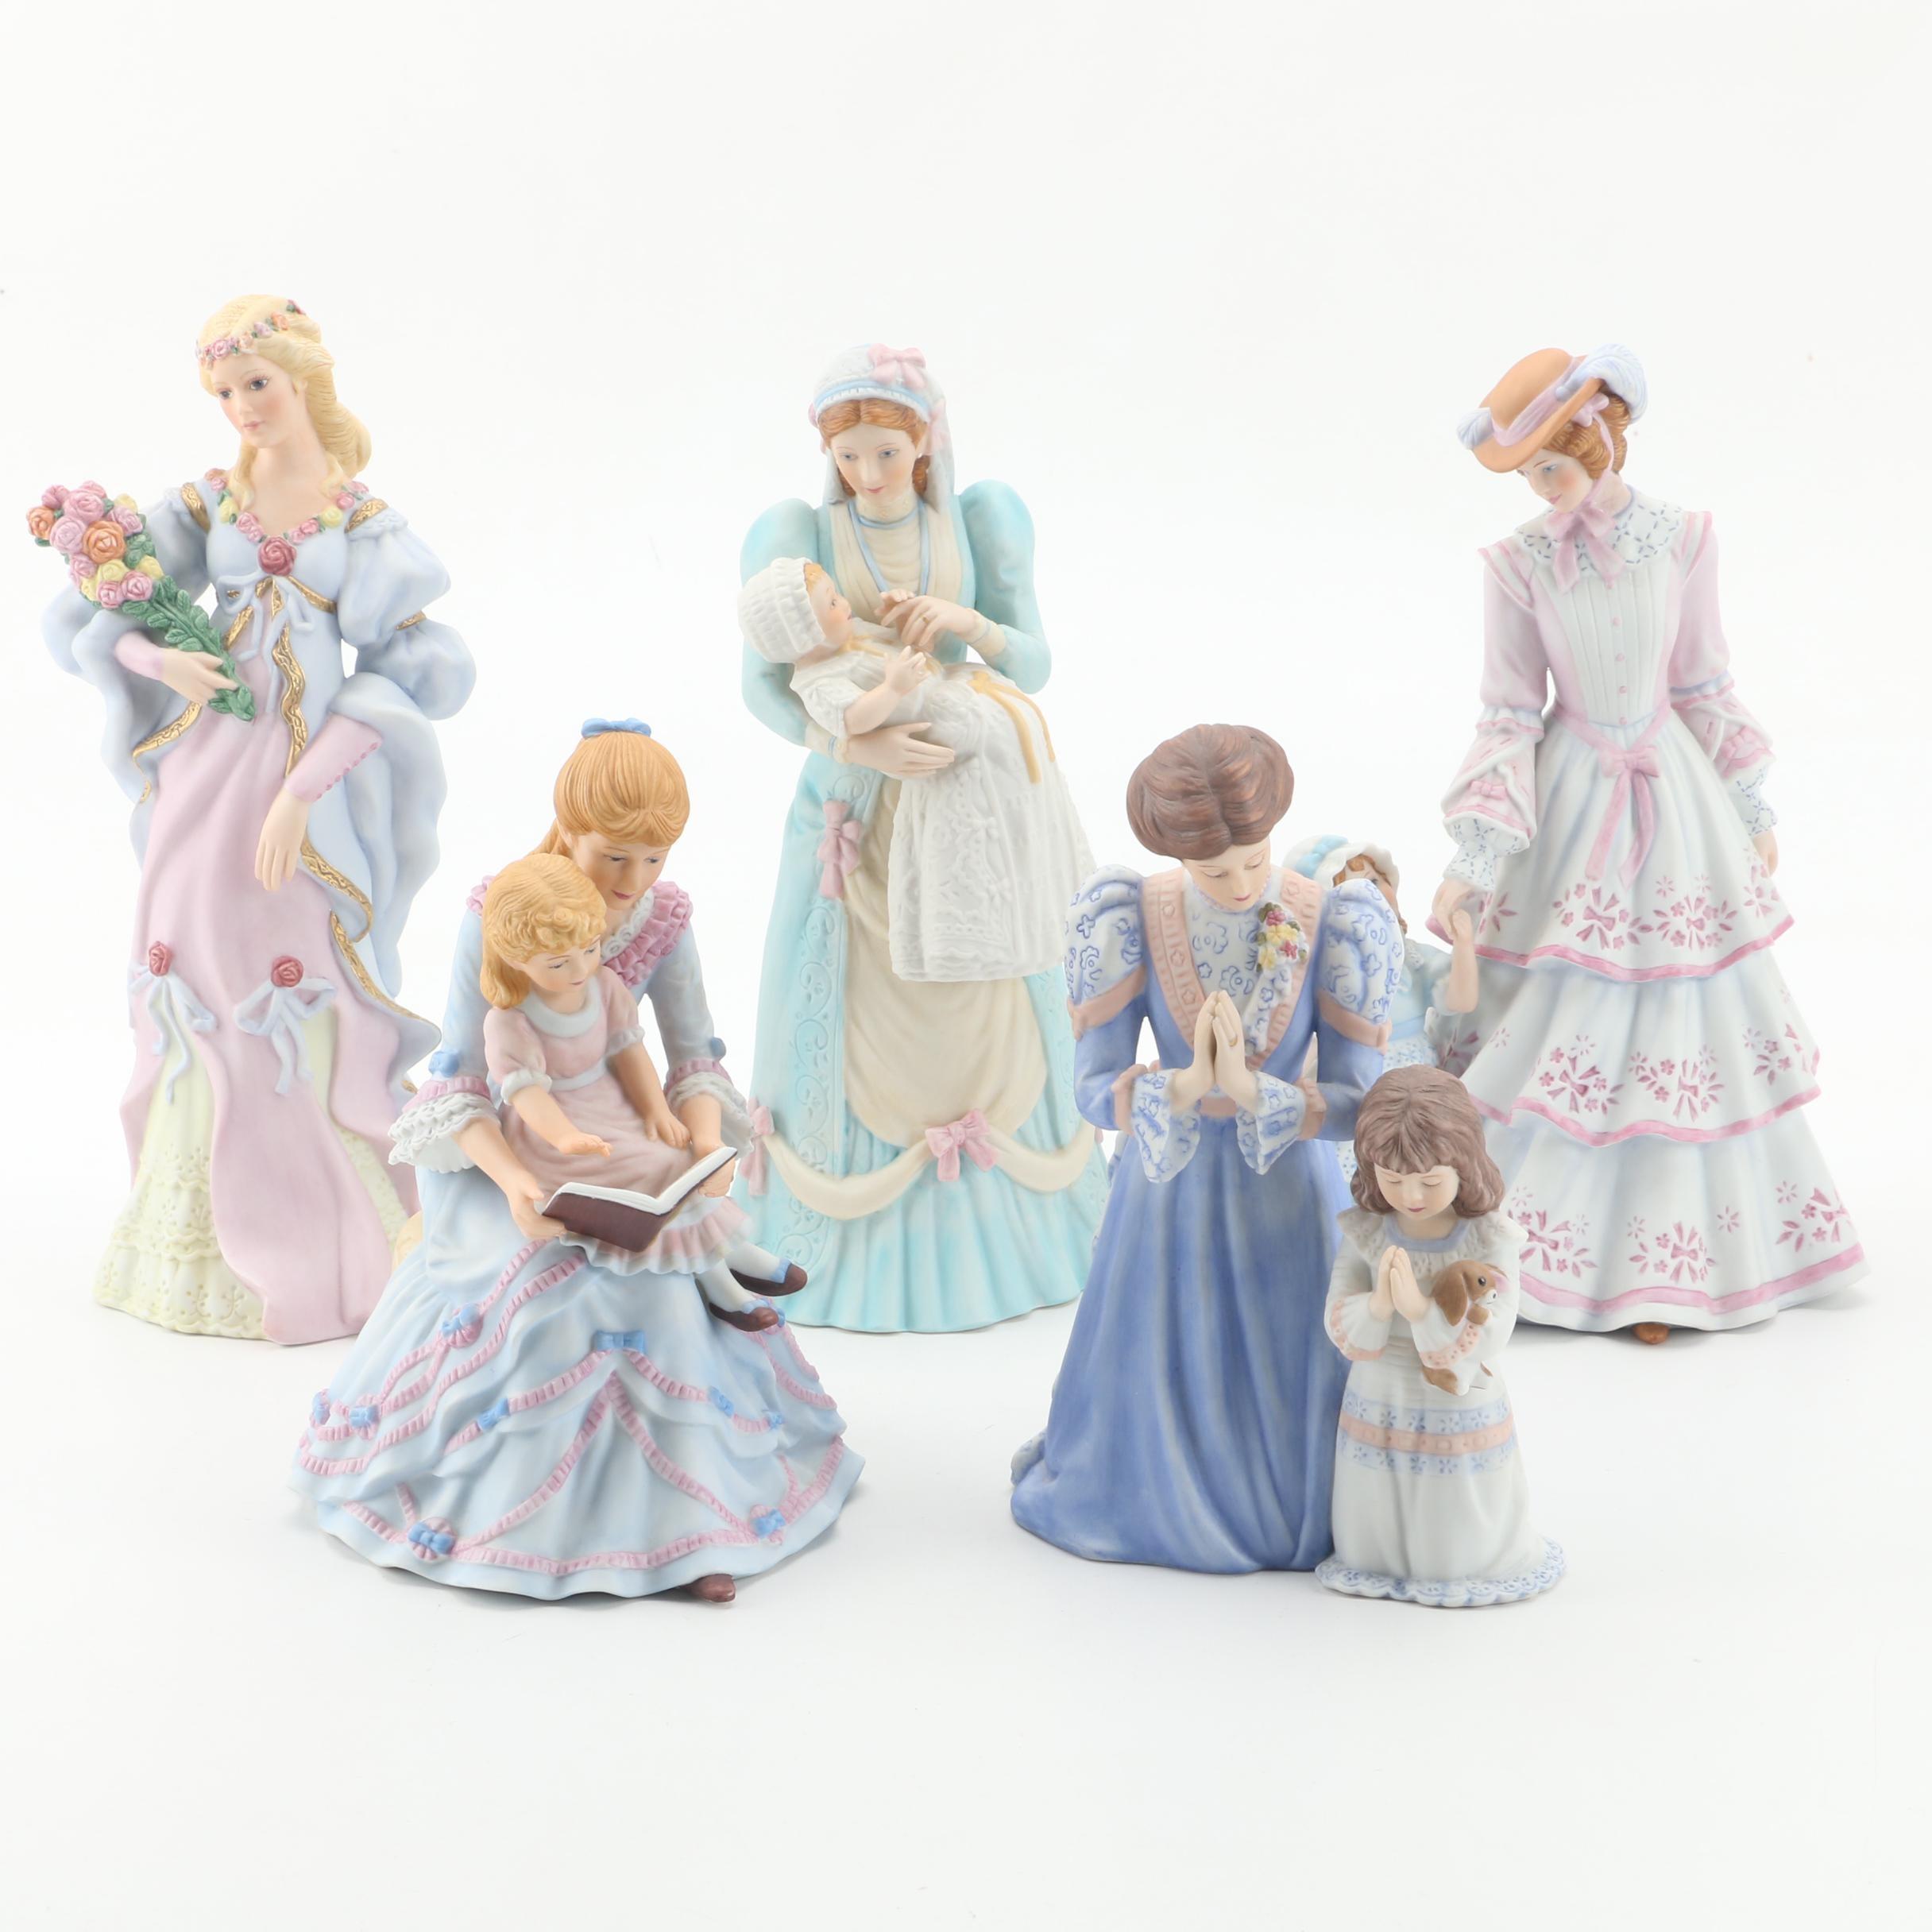 Lenox Fine Porcelain Figurines